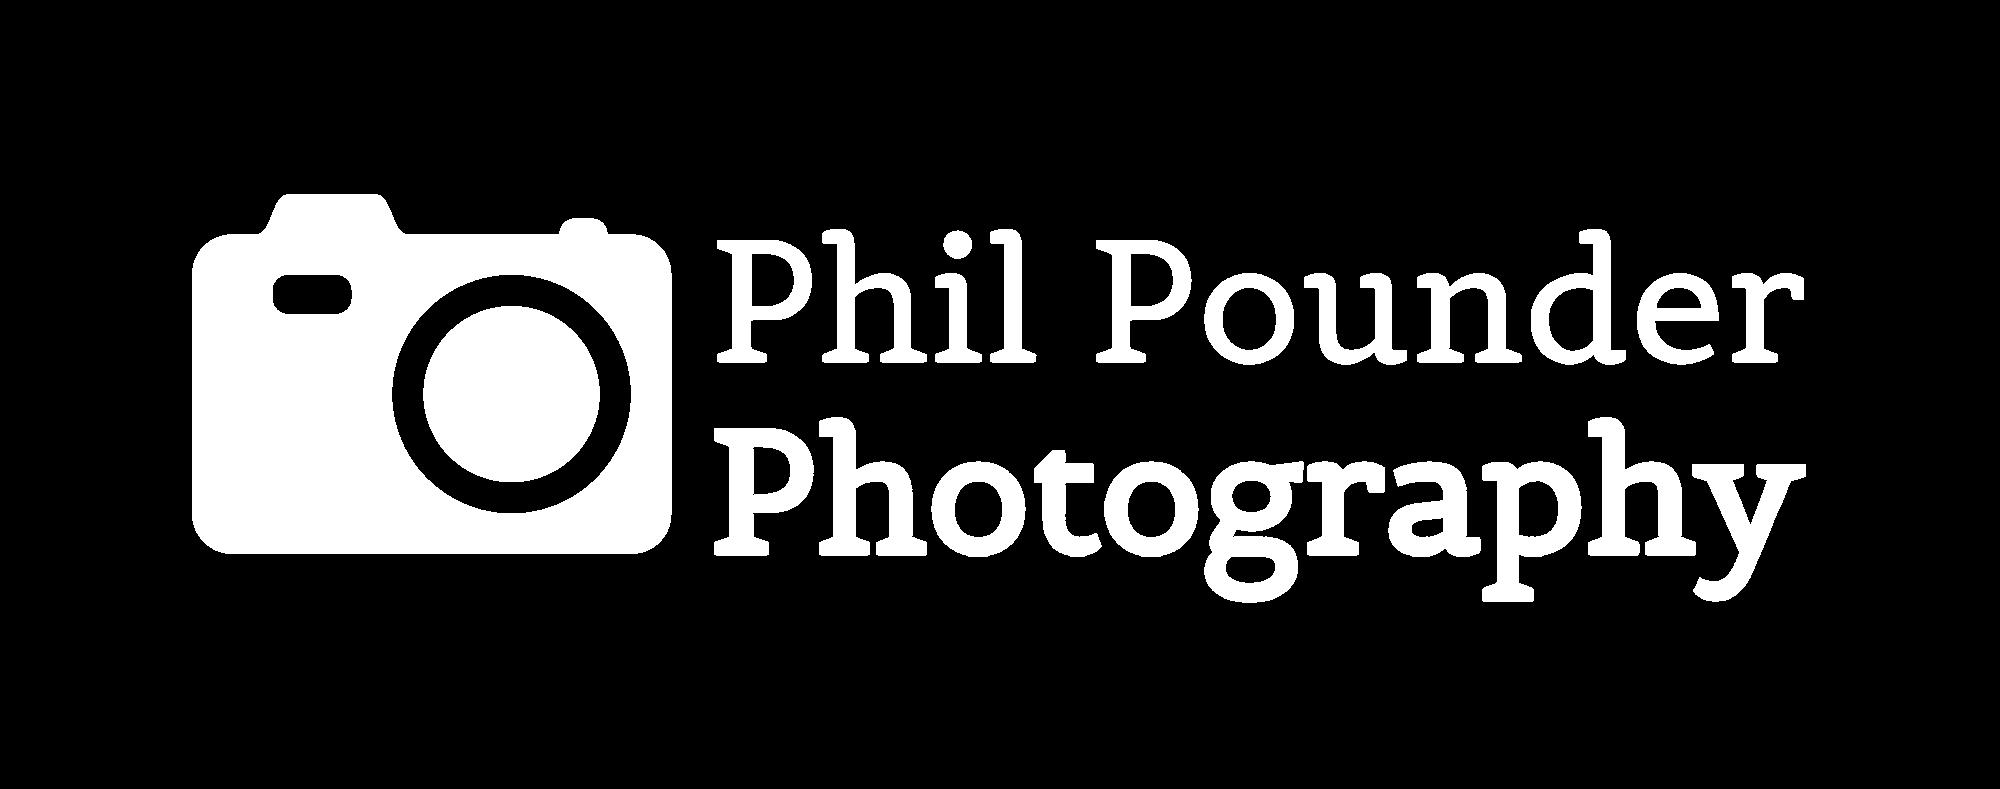 Phil Pounder-logo-white.png